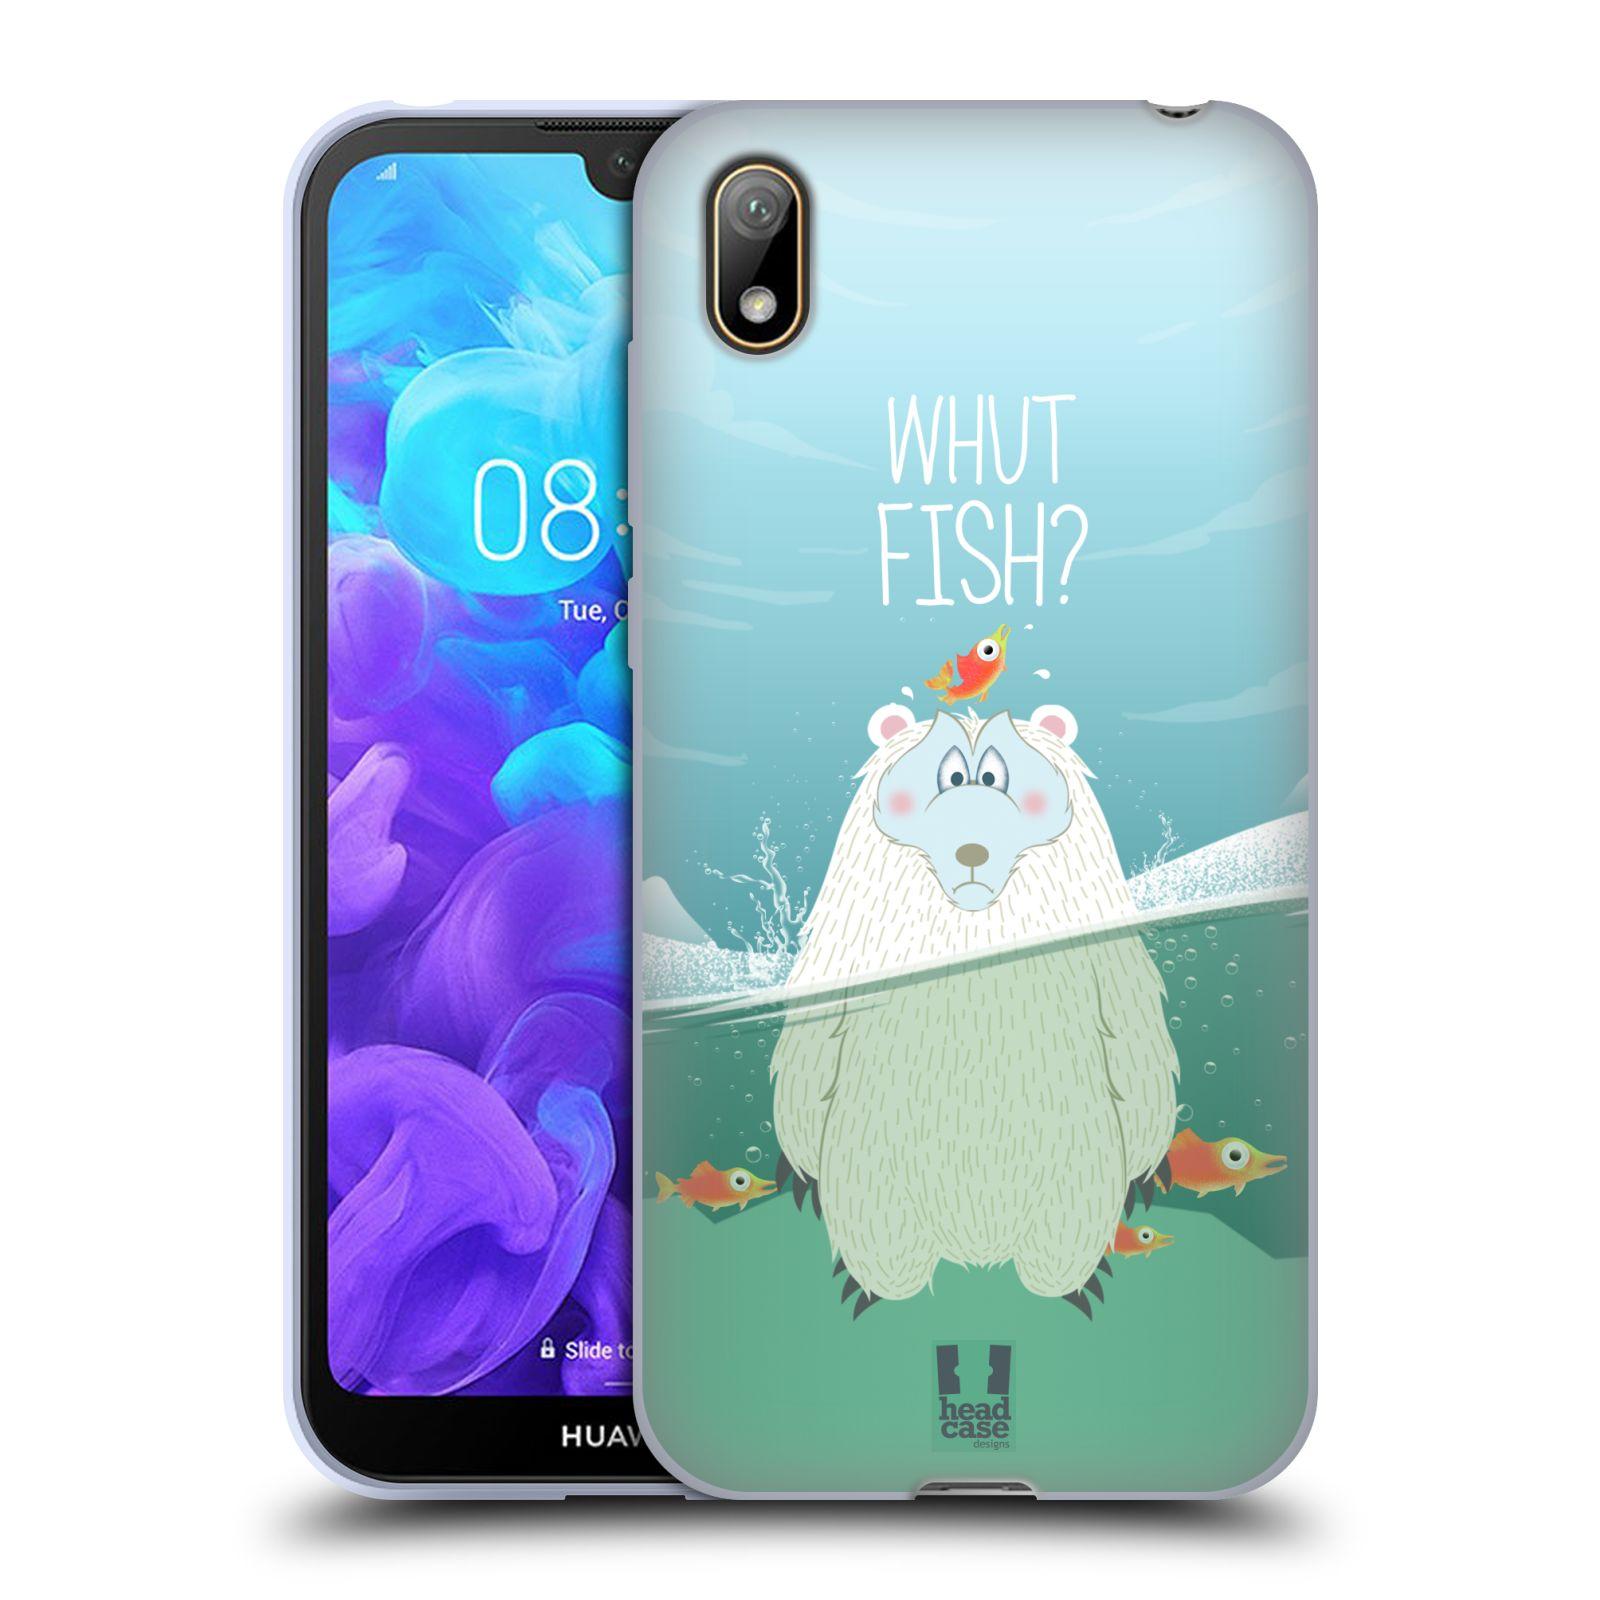 Silikonové pouzdro na mobil Huawei Y5 (2019) - Head Case - Medvěd Whut Fish?